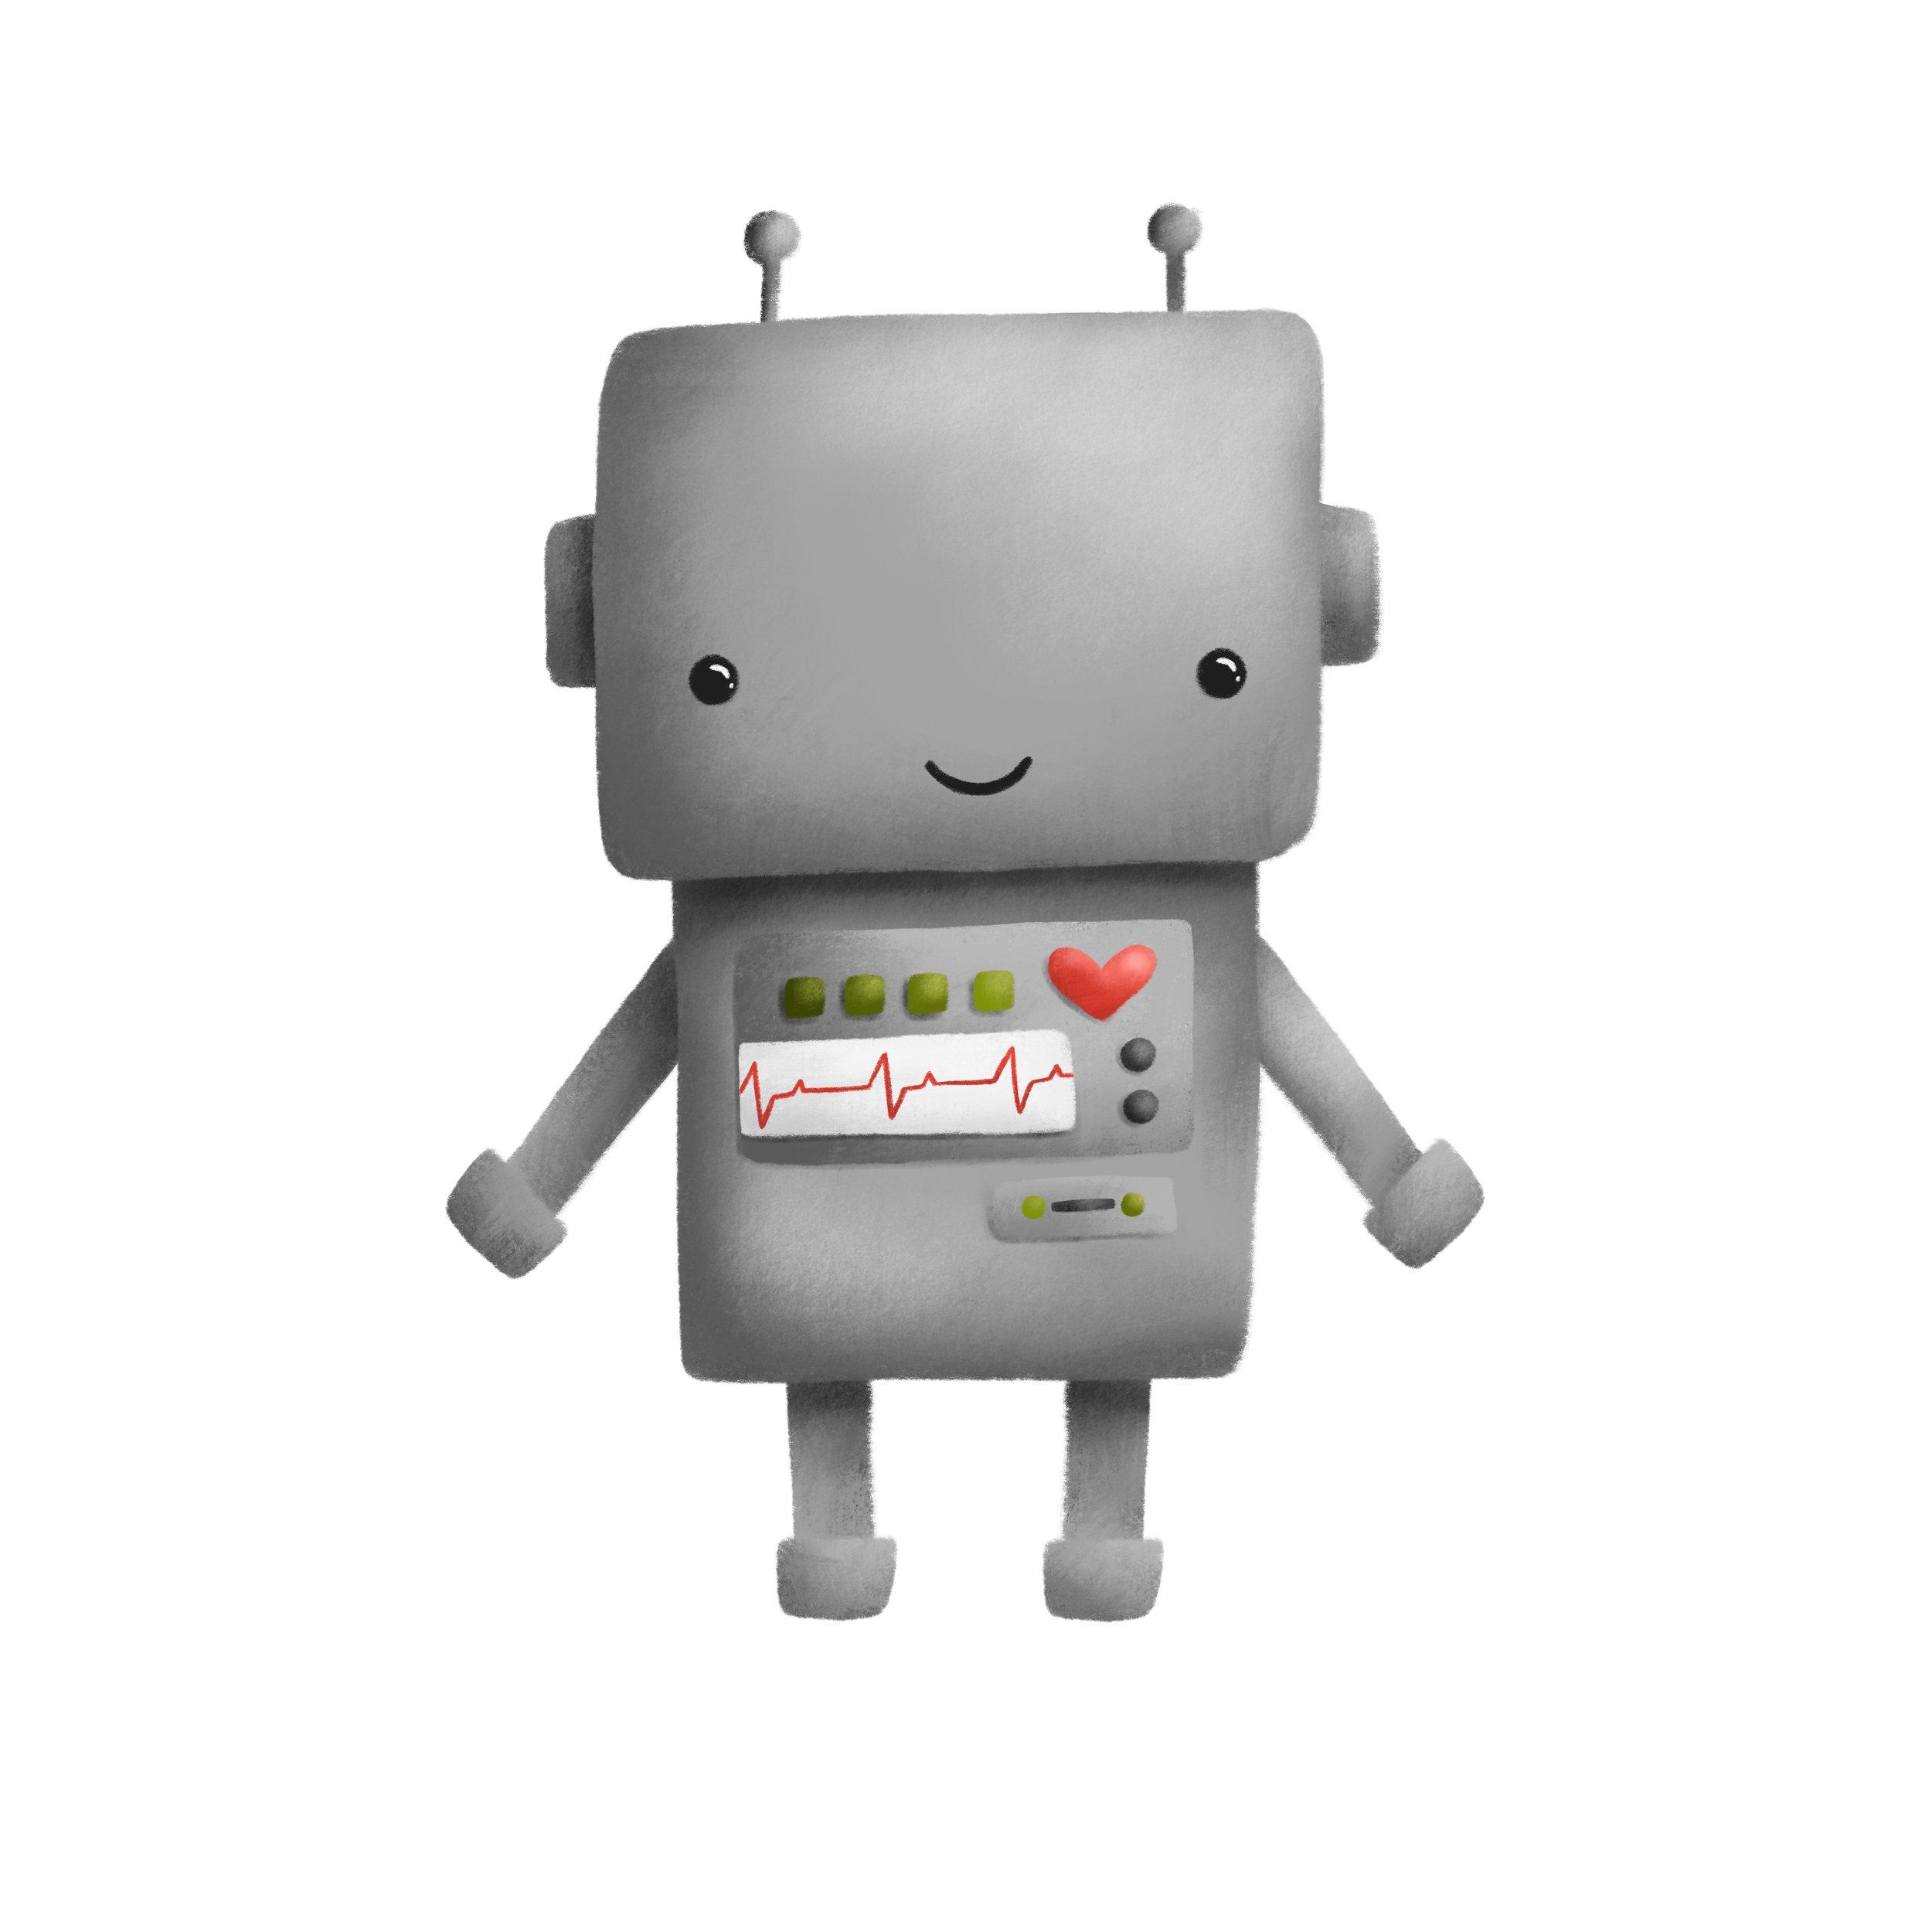 Robot_S.JPG